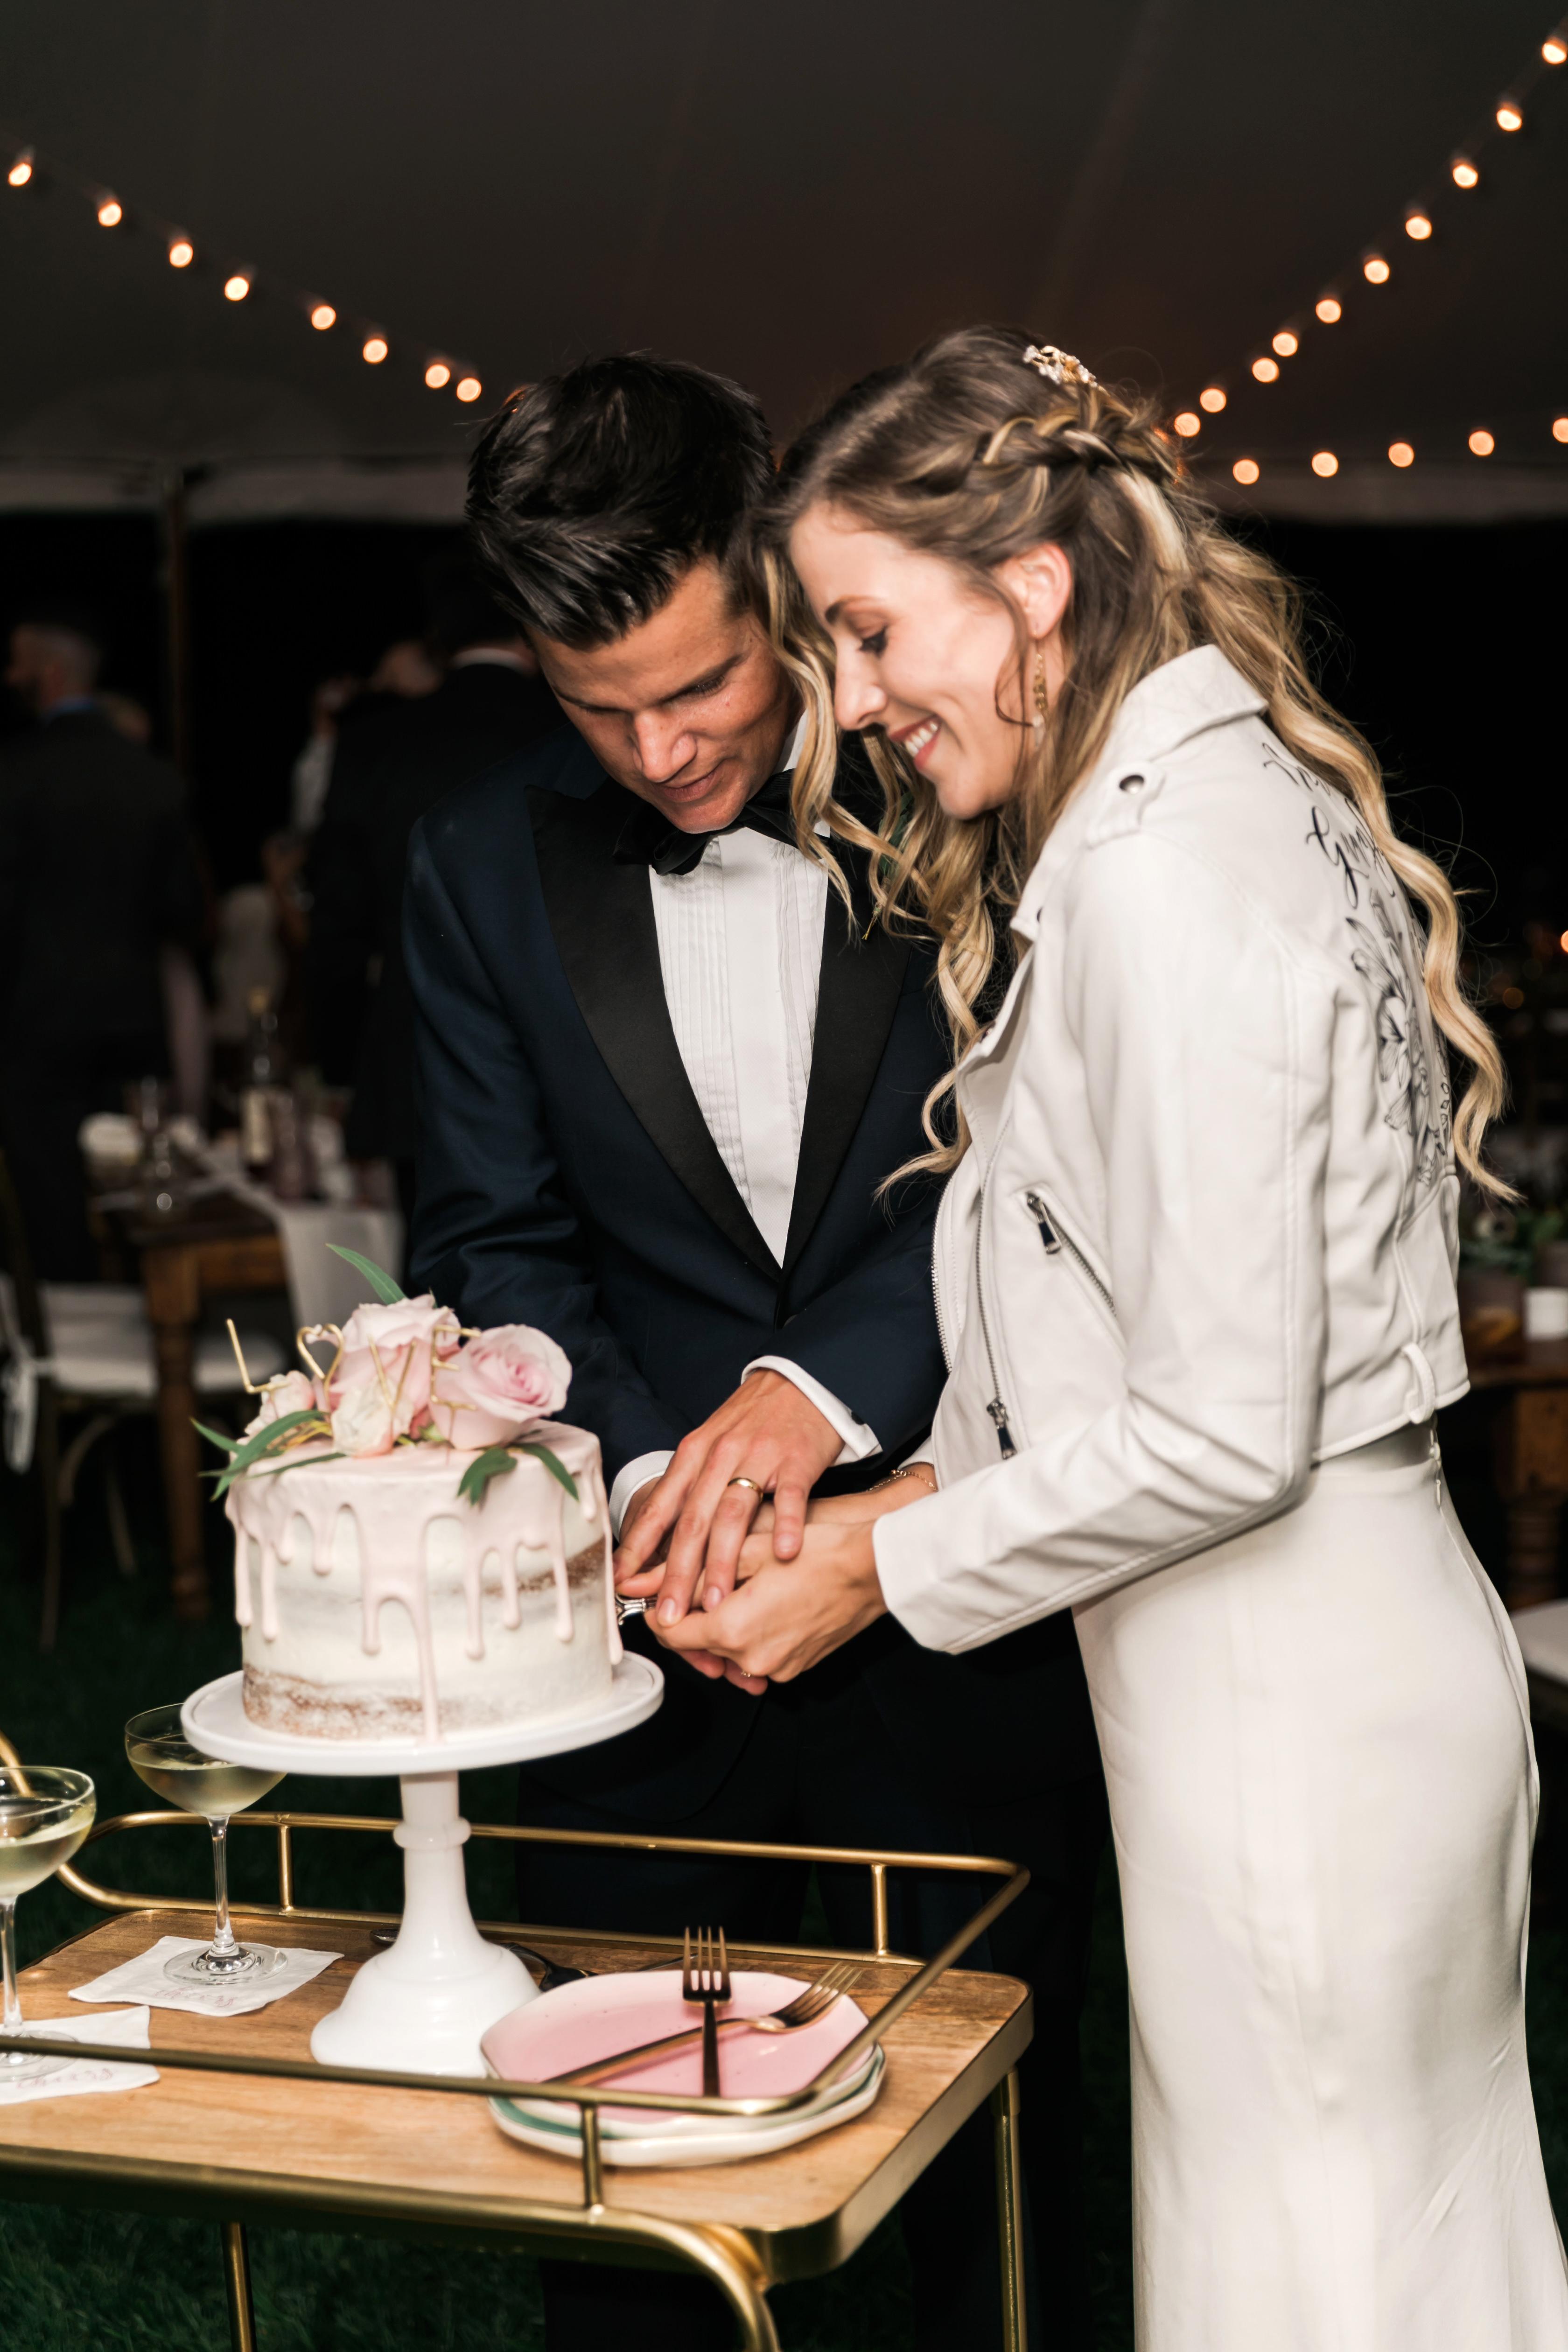 vanessa steven wedding cake cutting